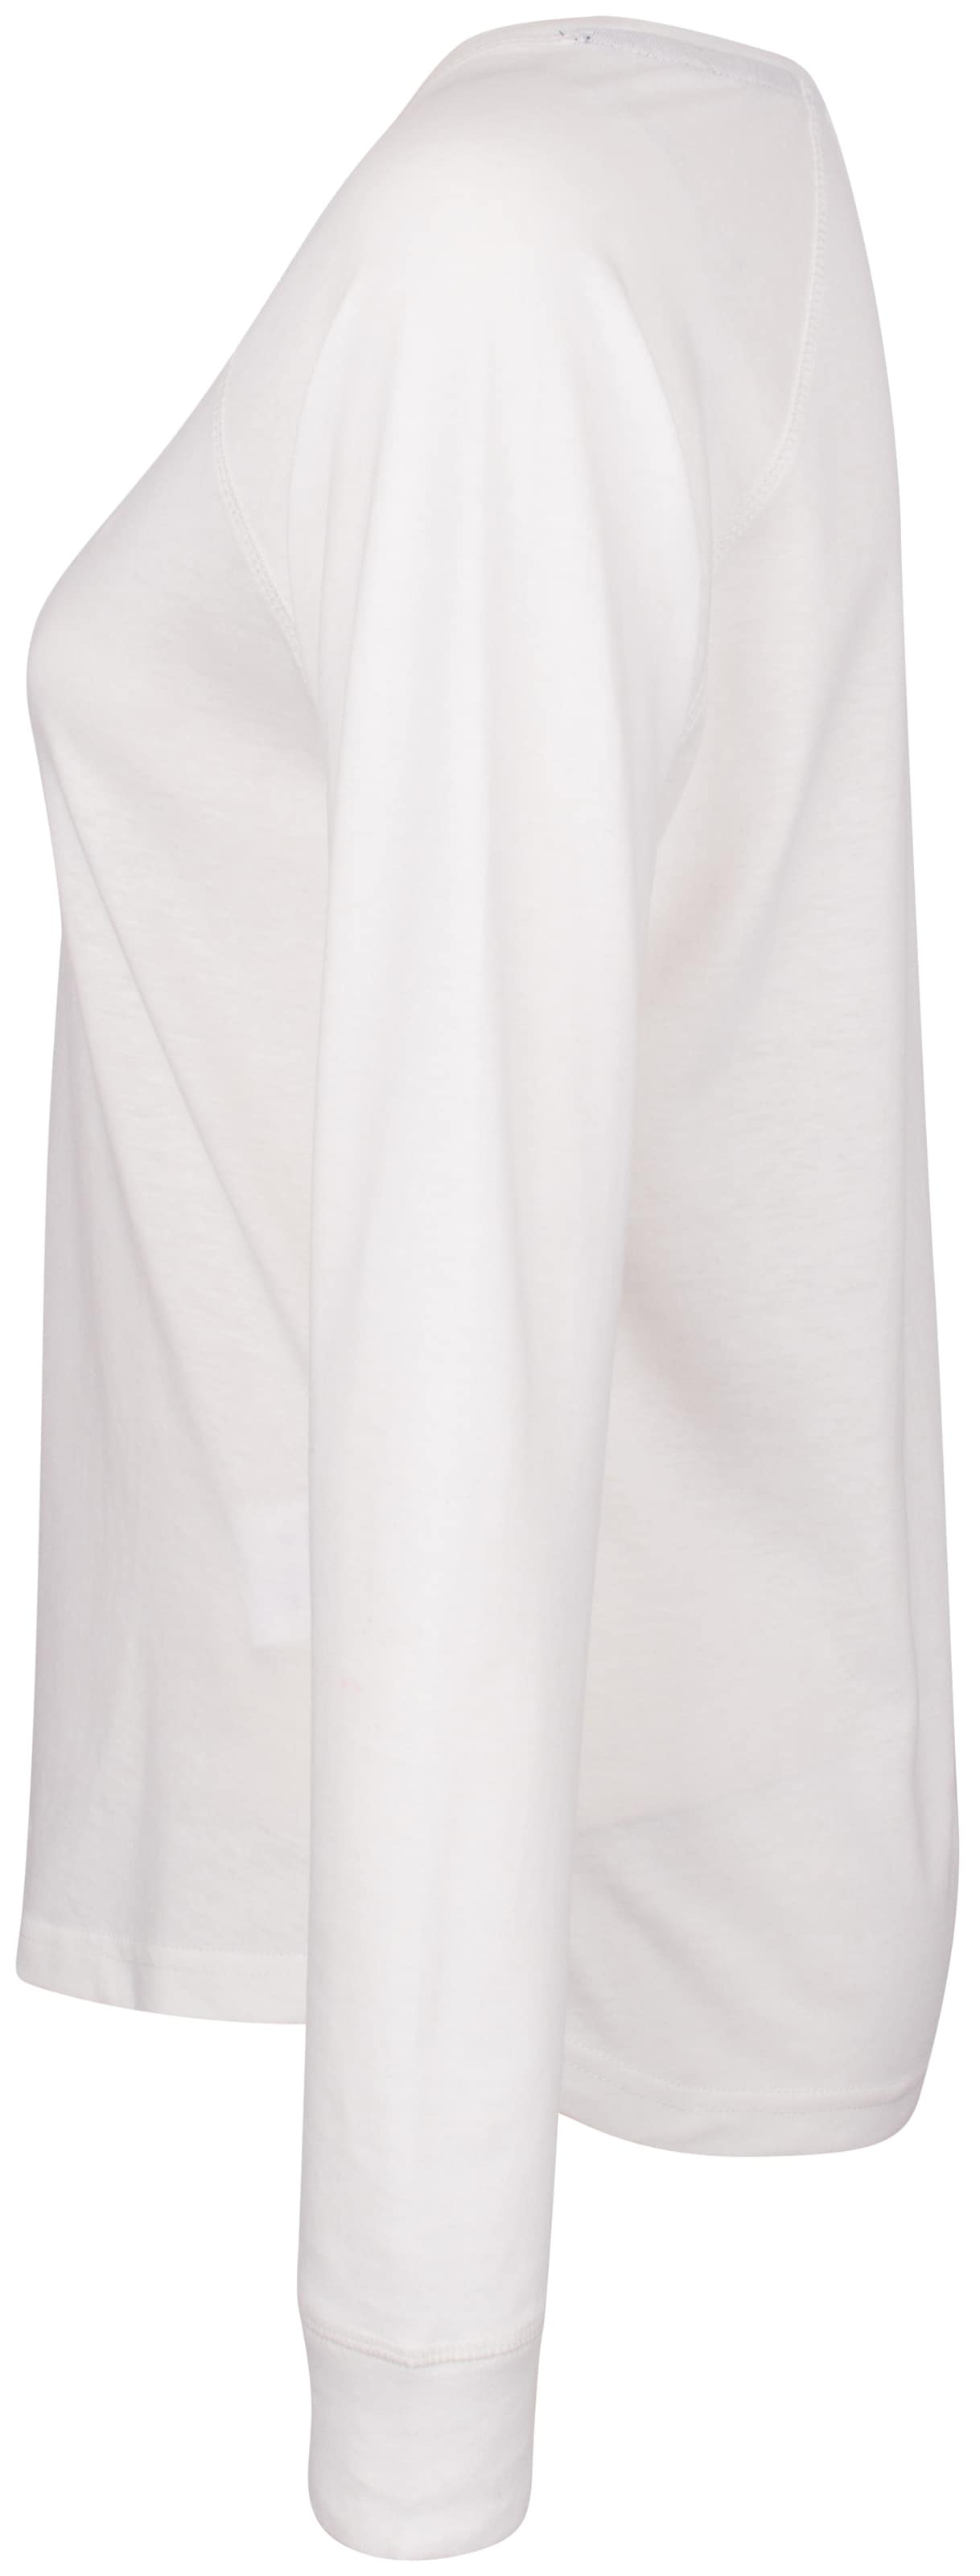 Blanc Dreimaster T En shirt T shirt Dreimaster T shirt En Dreimaster Blanc bf76gy